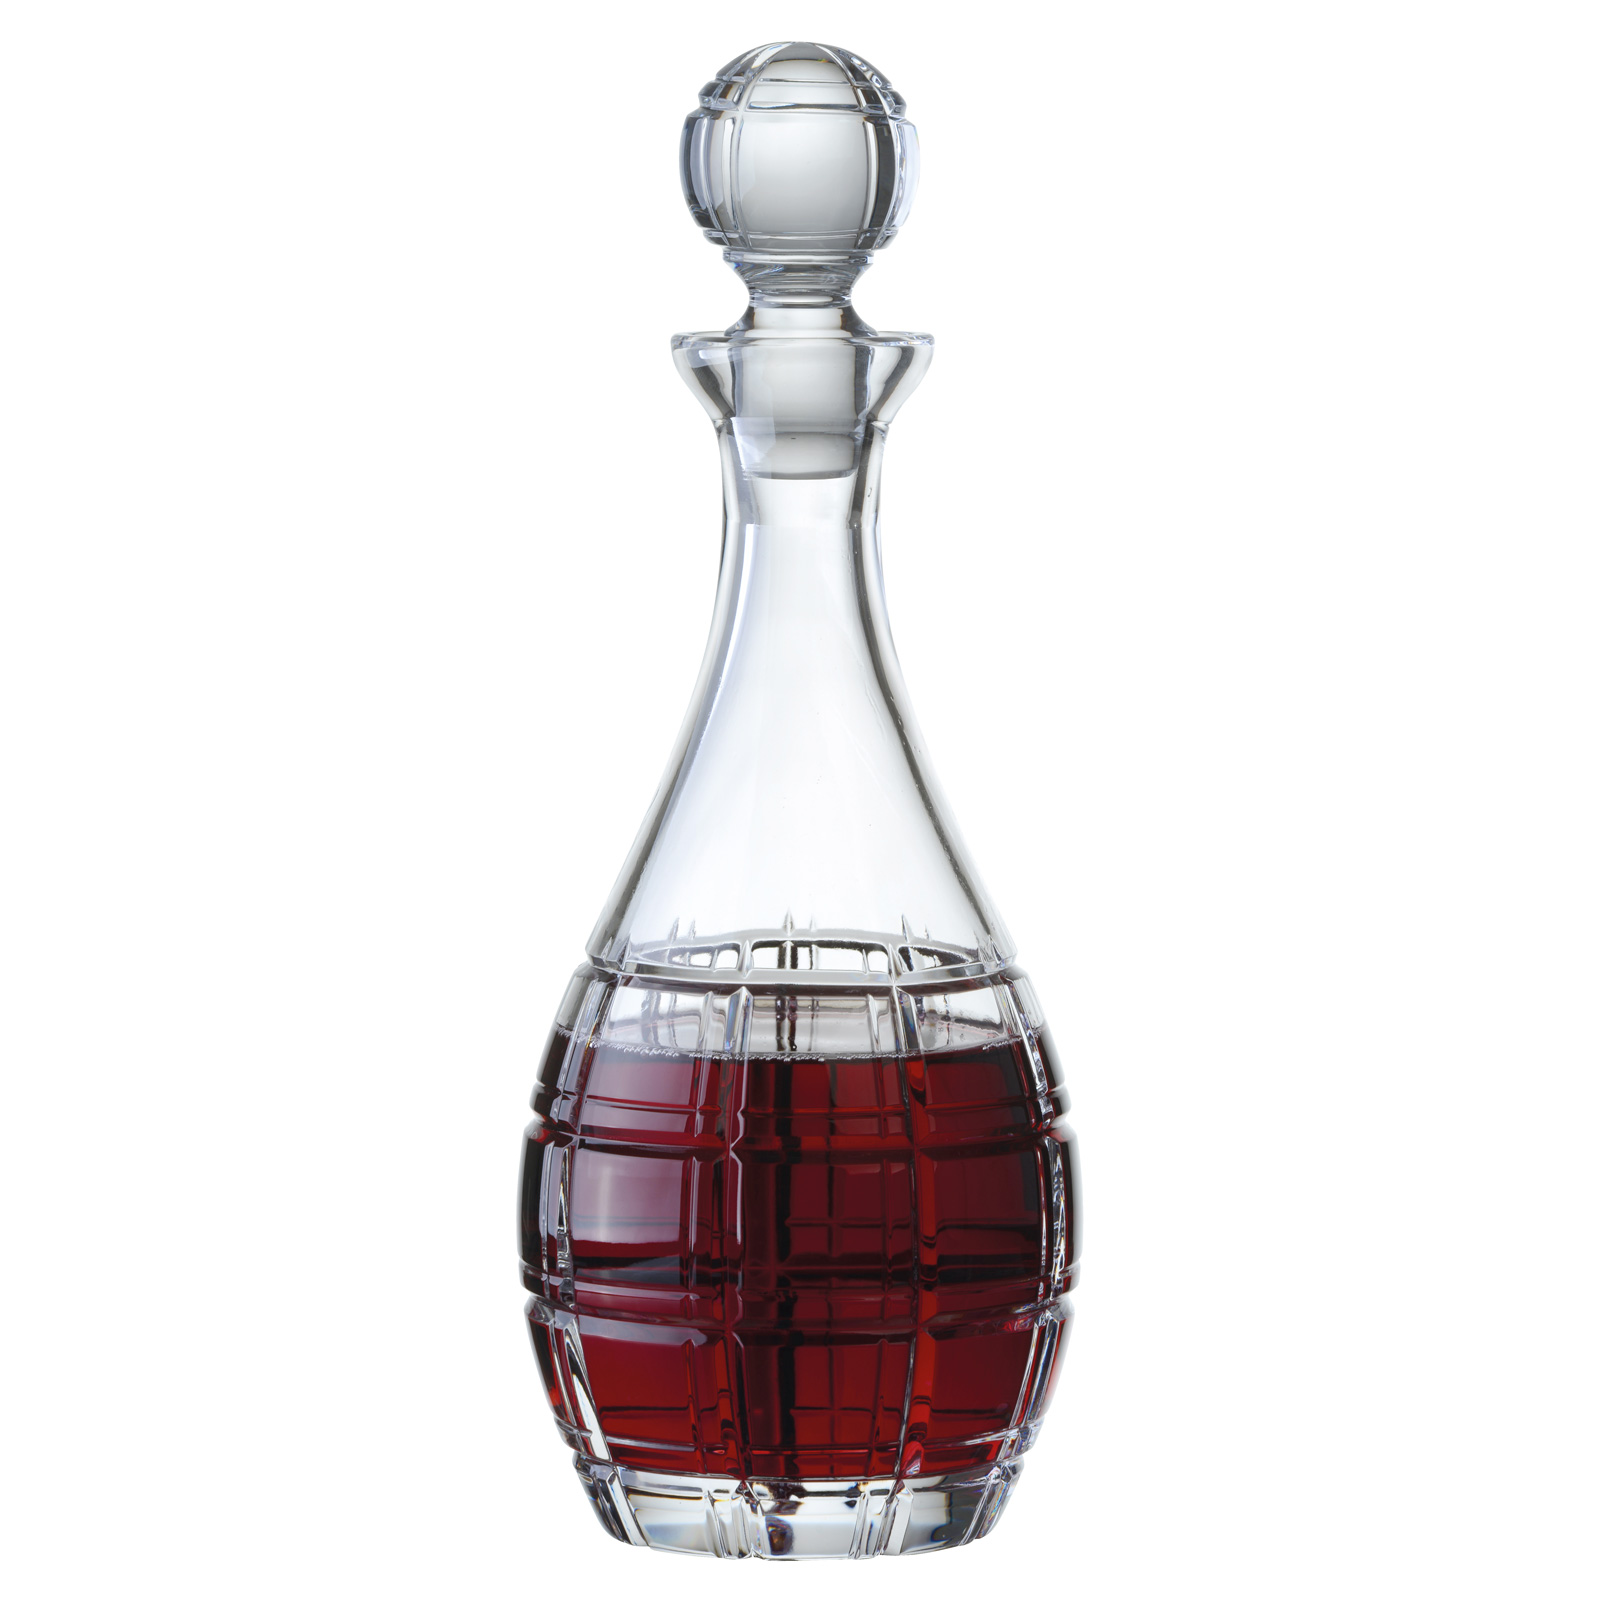 Shard Wine Decanter by Anton Studio Designs